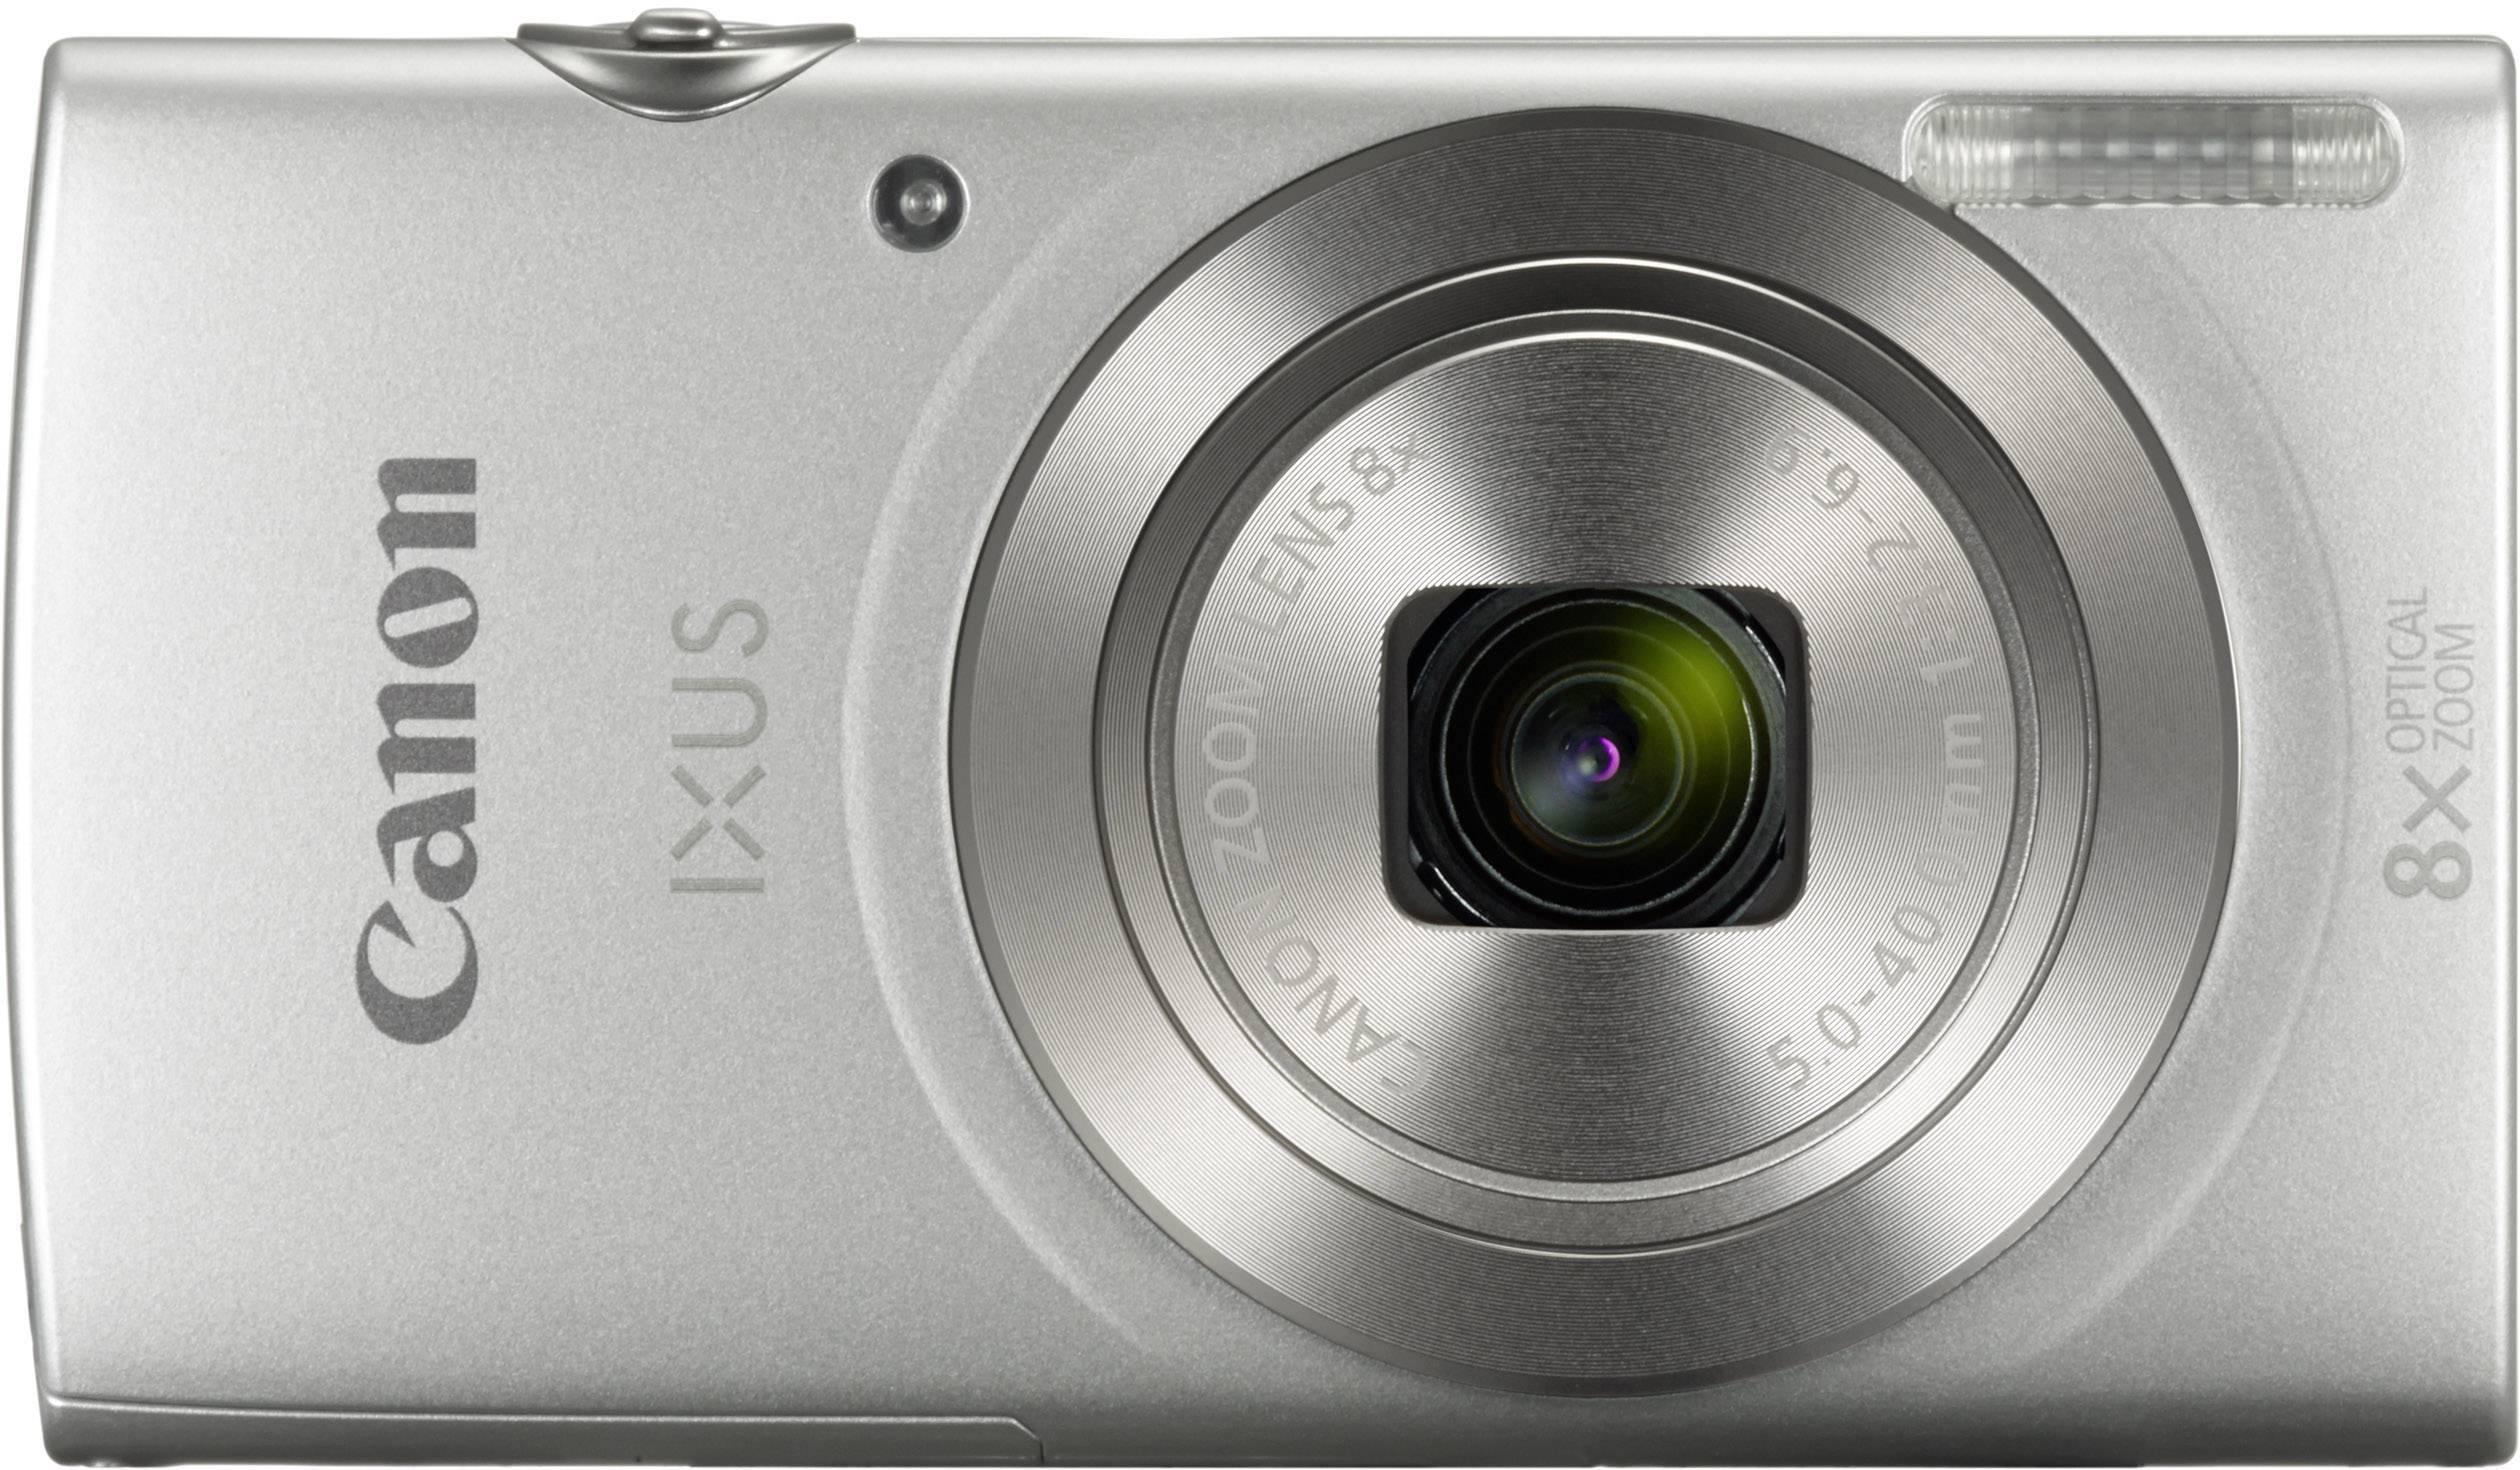 Digitální fotoaparát Canon IXUS 185, 20 MPix, Zoom (optický): 8 x, stříbrná